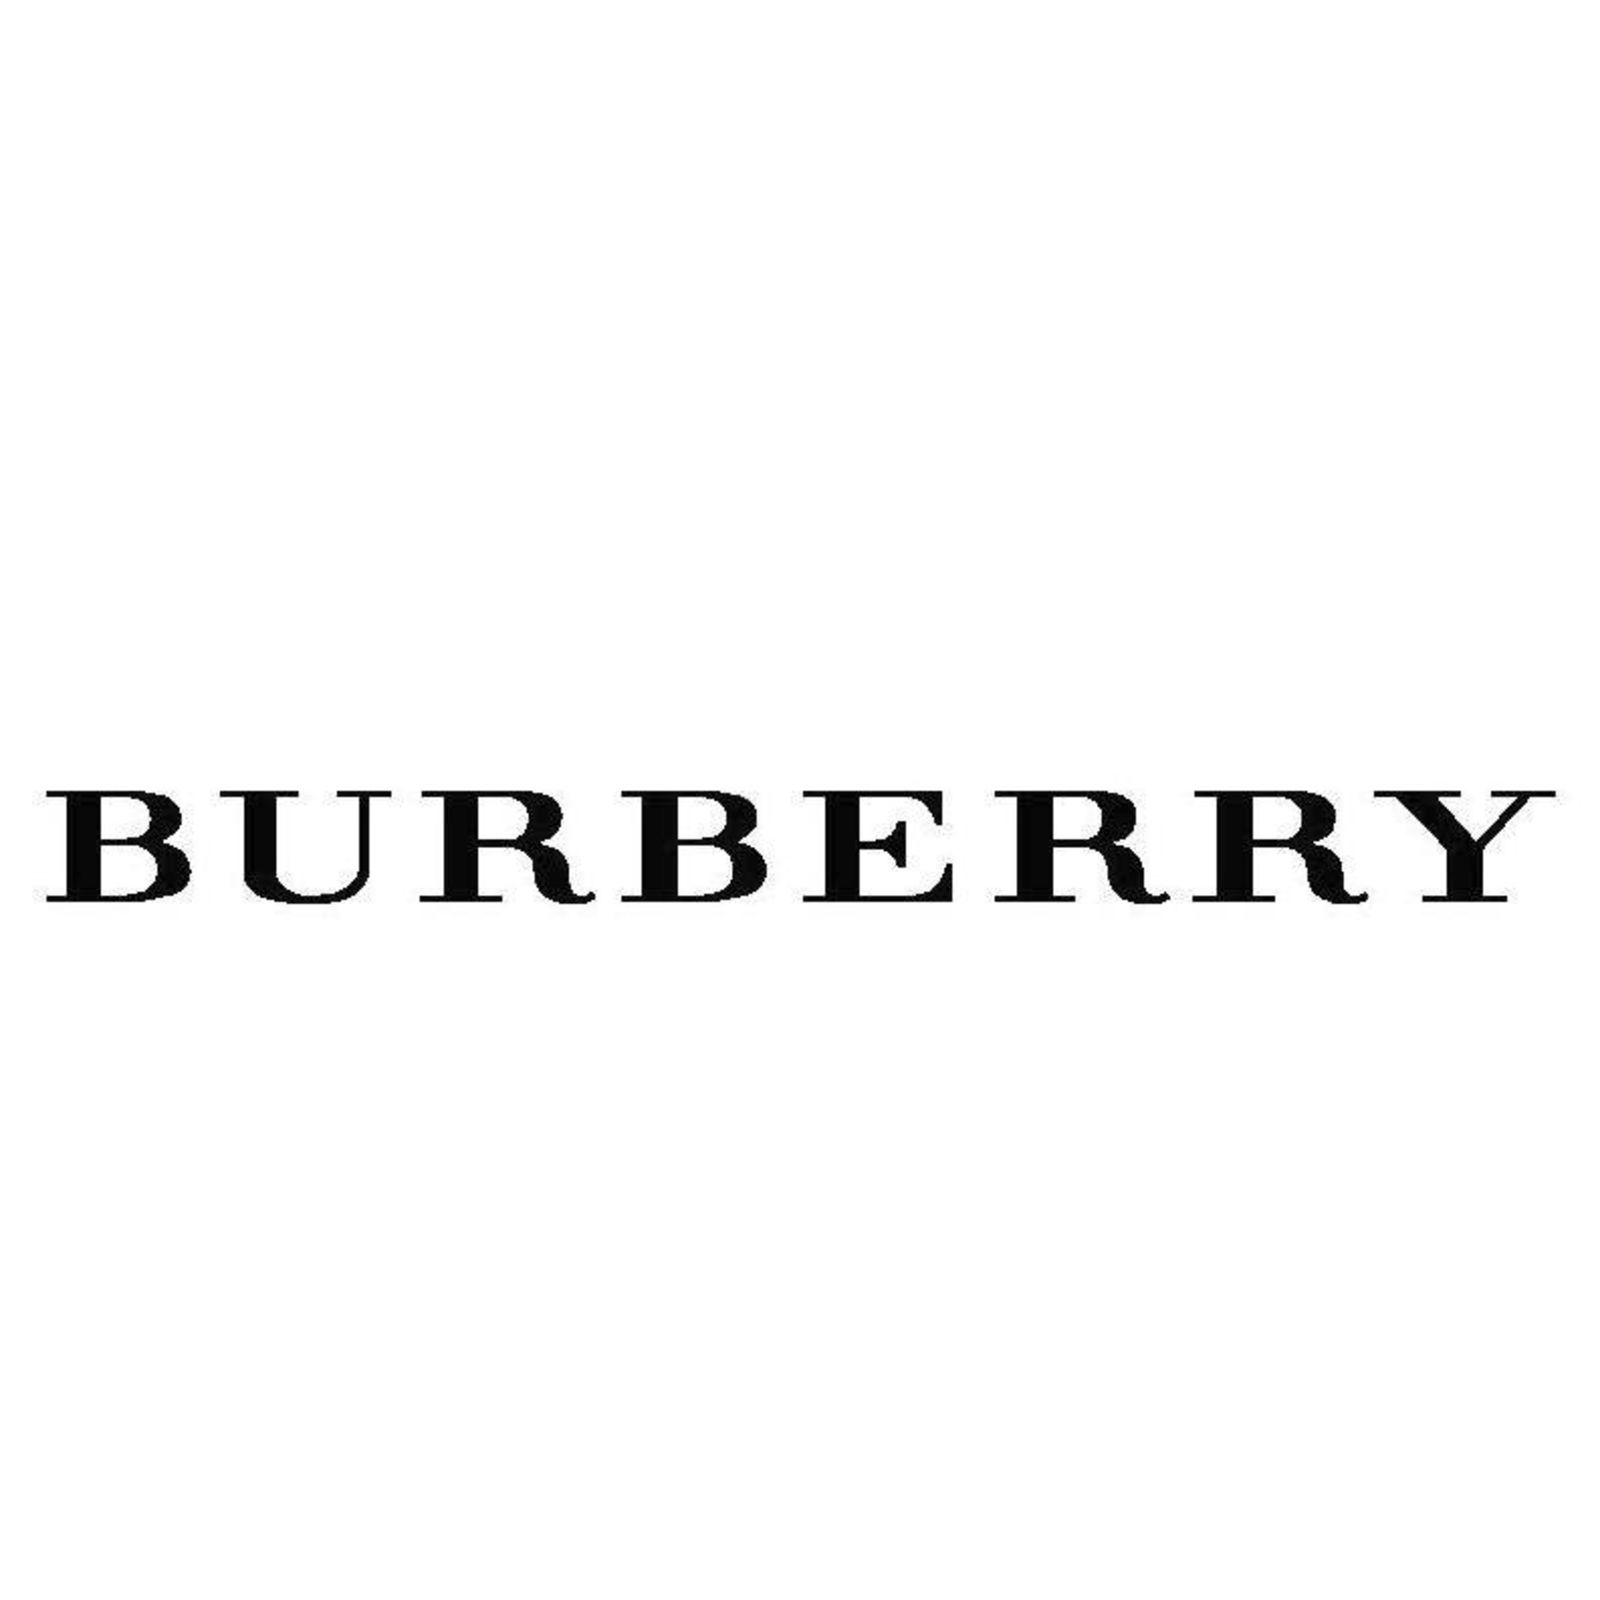 BURBERRY (Image 1)